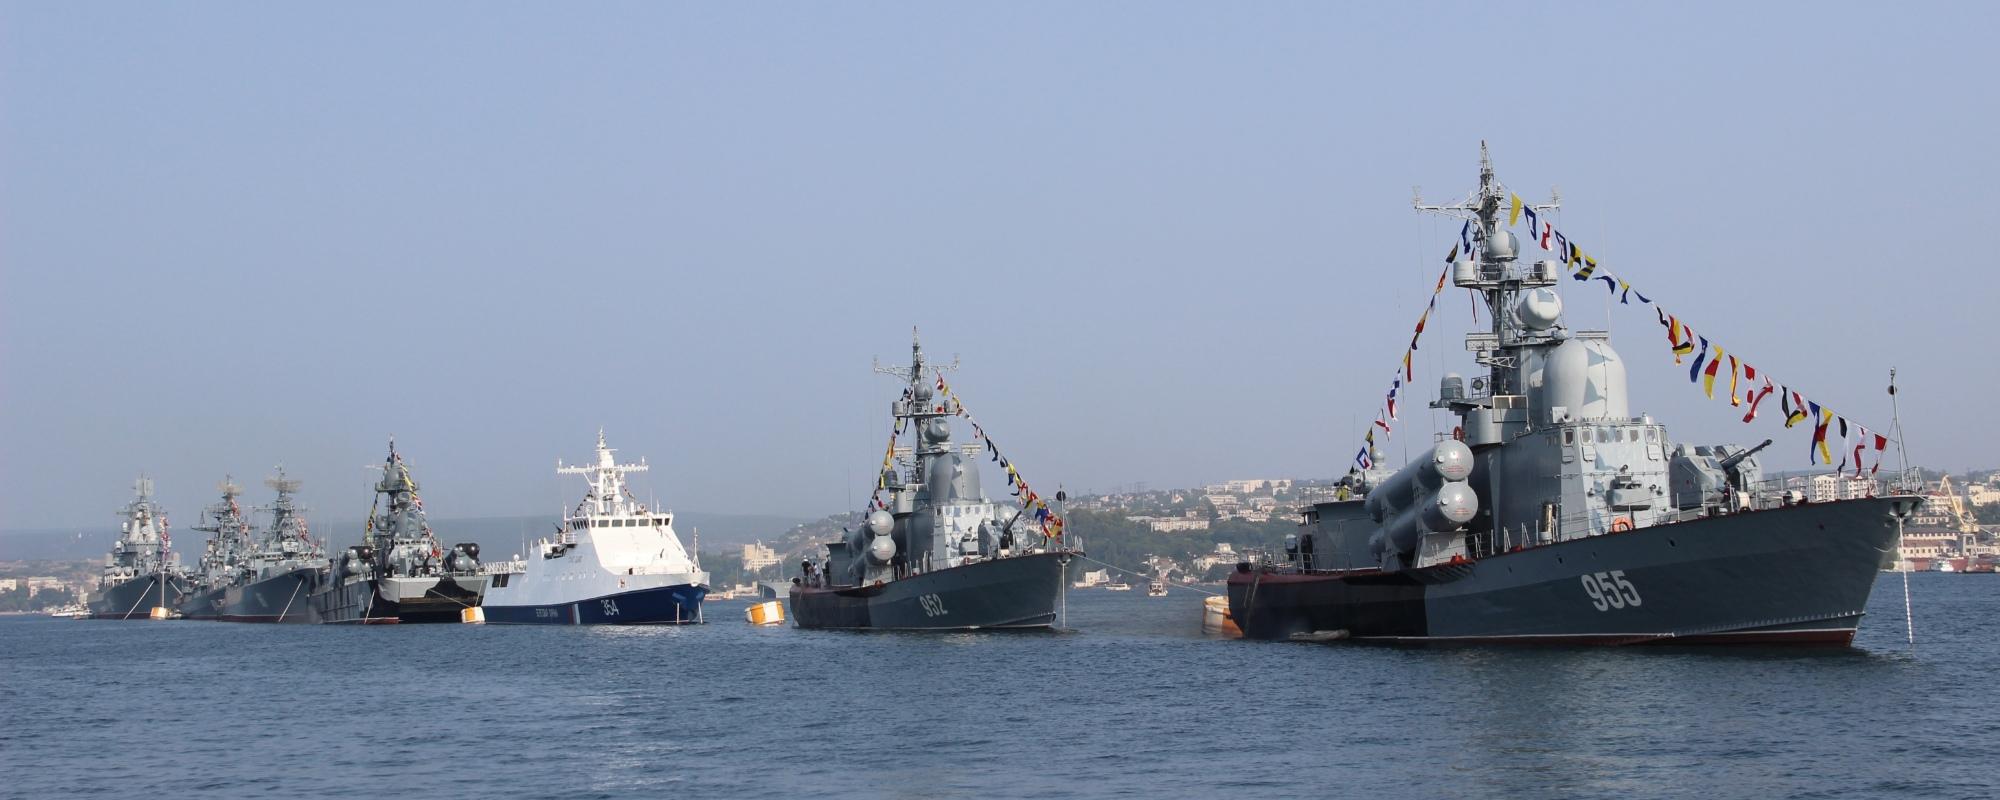 A line of military naval vessels in Sevastopol